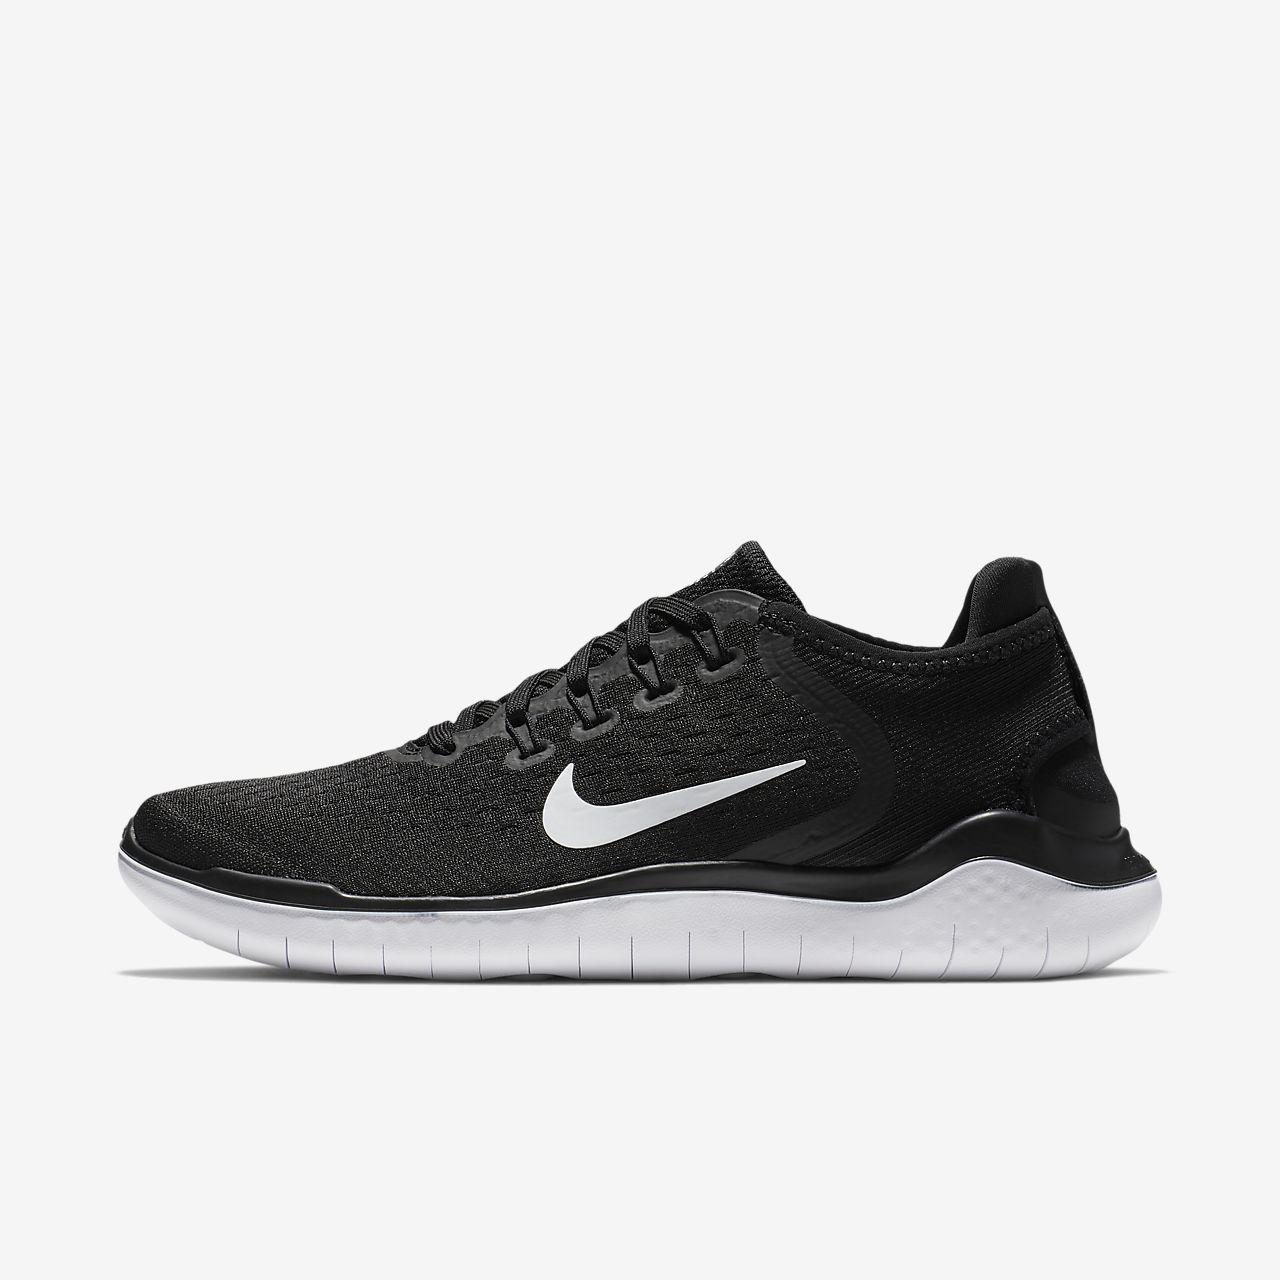 Nike Free RN 2018 Damen-Laufschuh